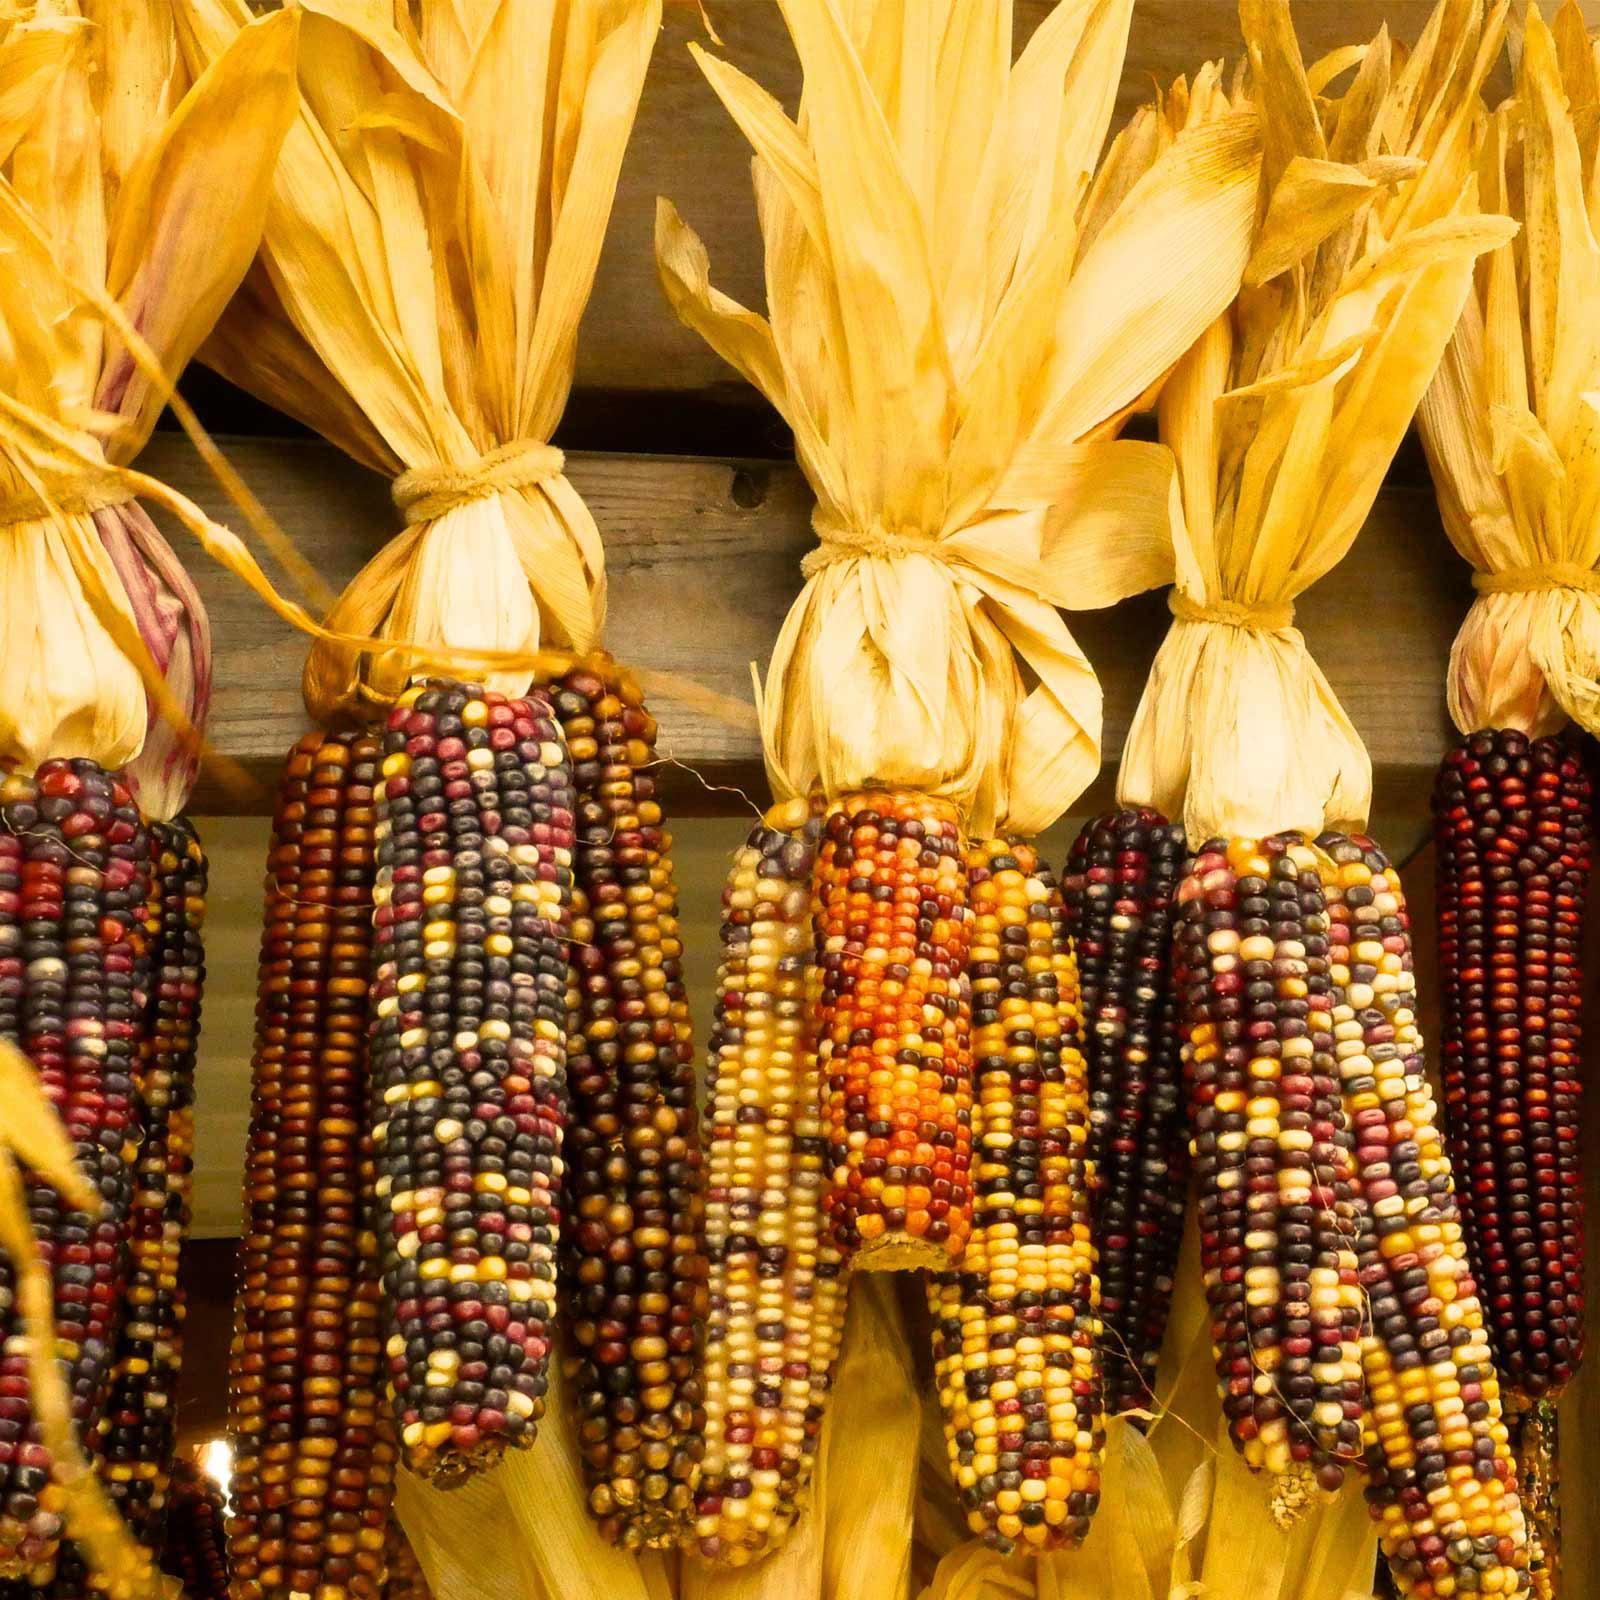 Ornamental Indian Corn Garden Seeds - 1 Lb - Non-GMO, Heirloom, Open Pollinated Vegetable Gardening Seeds - Decorative